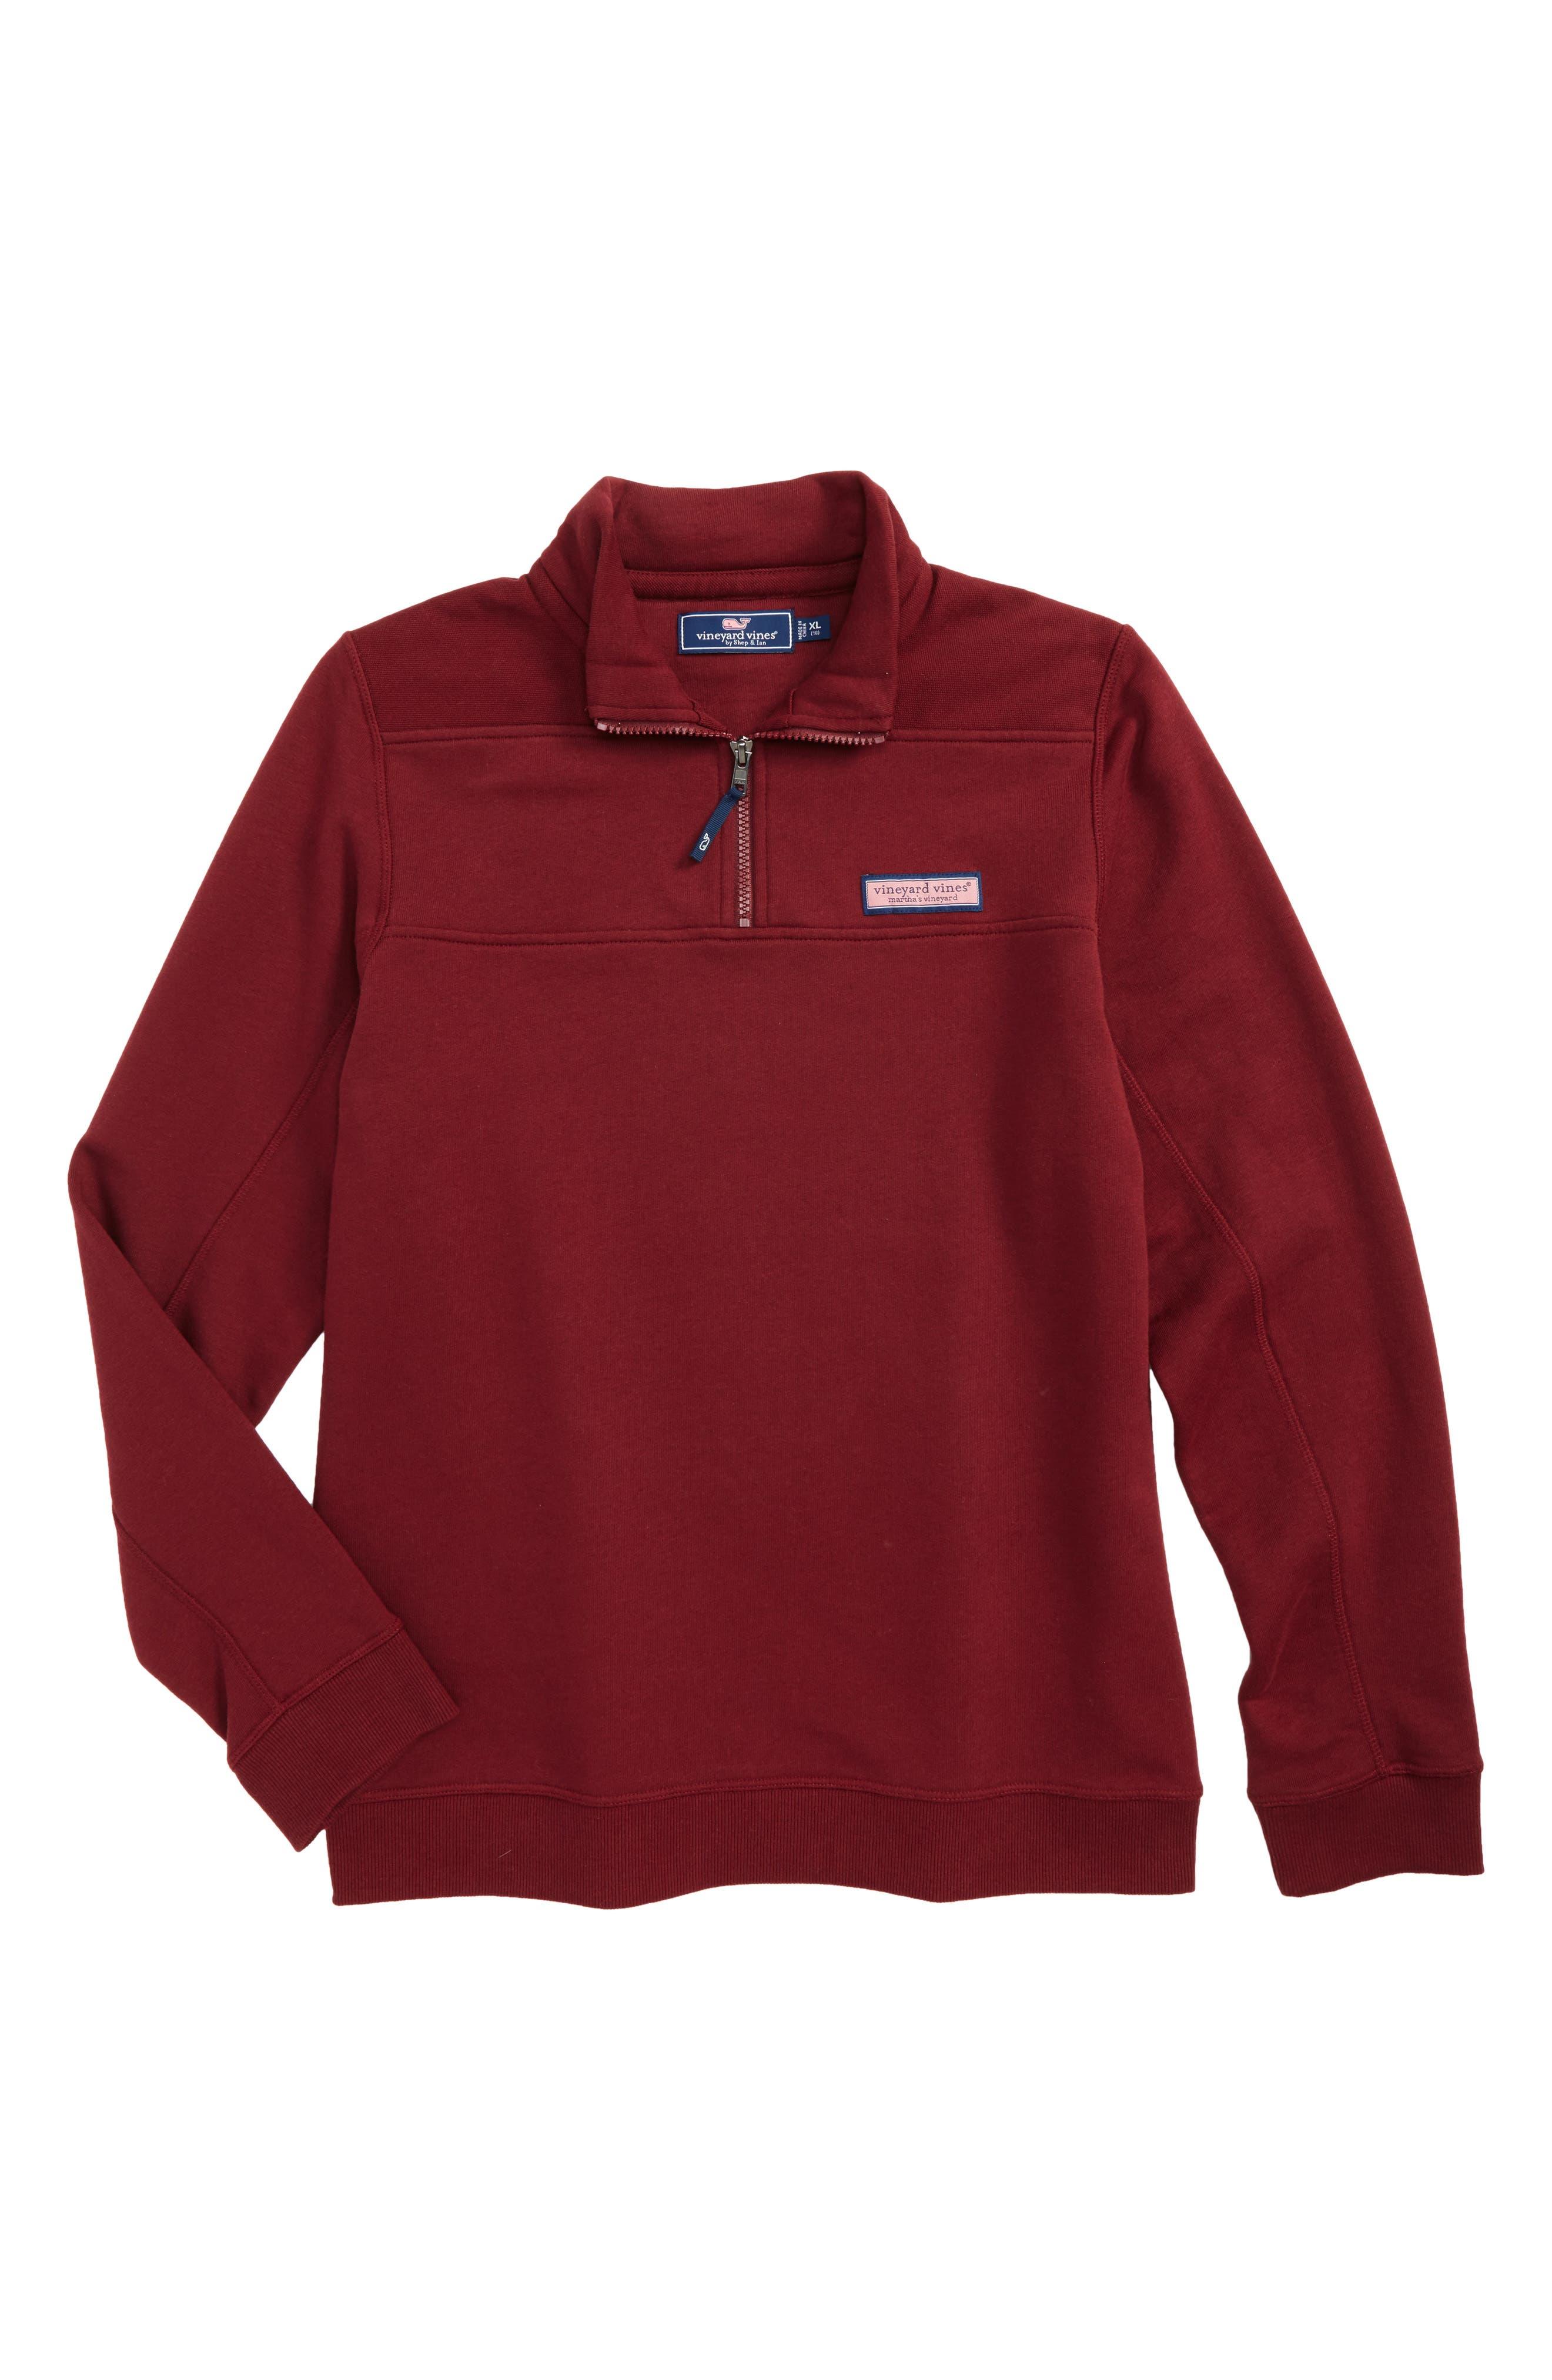 VINEYARD VINES, Classic Shep Quarter Zip Pullover, Main thumbnail 1, color, CRIMSON